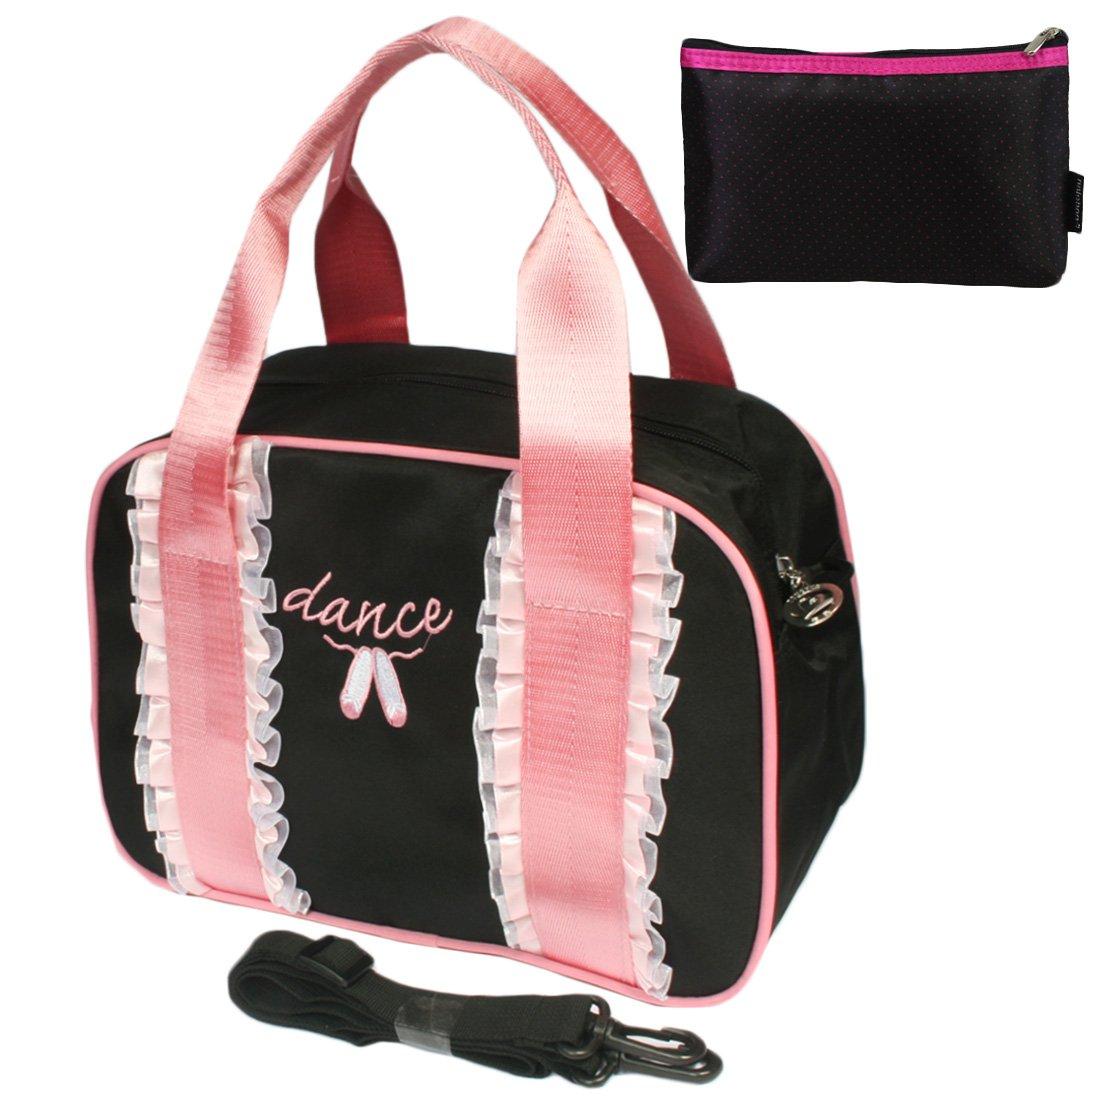 kilofly Ballerina Ballet Slippers Dance Ruffles Sling Bag Handbag + Handy Pouch AWP406set2